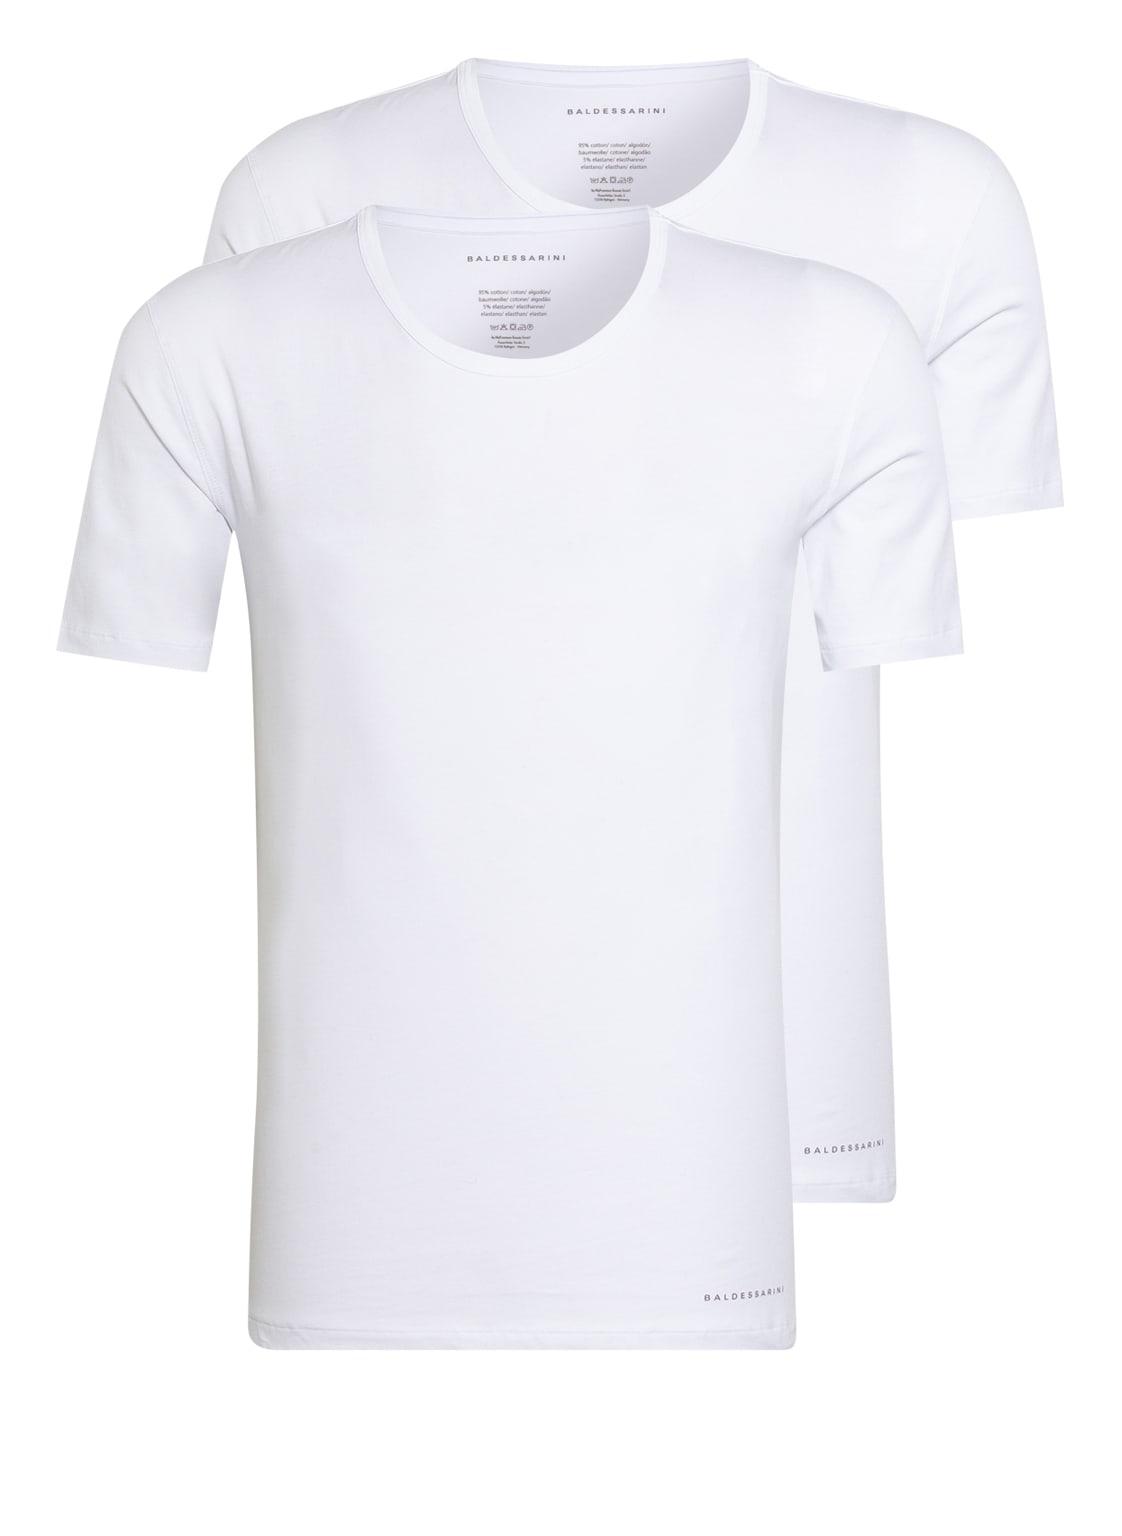 Image of Baldessarini 2er-Pack T-Shirts weiss